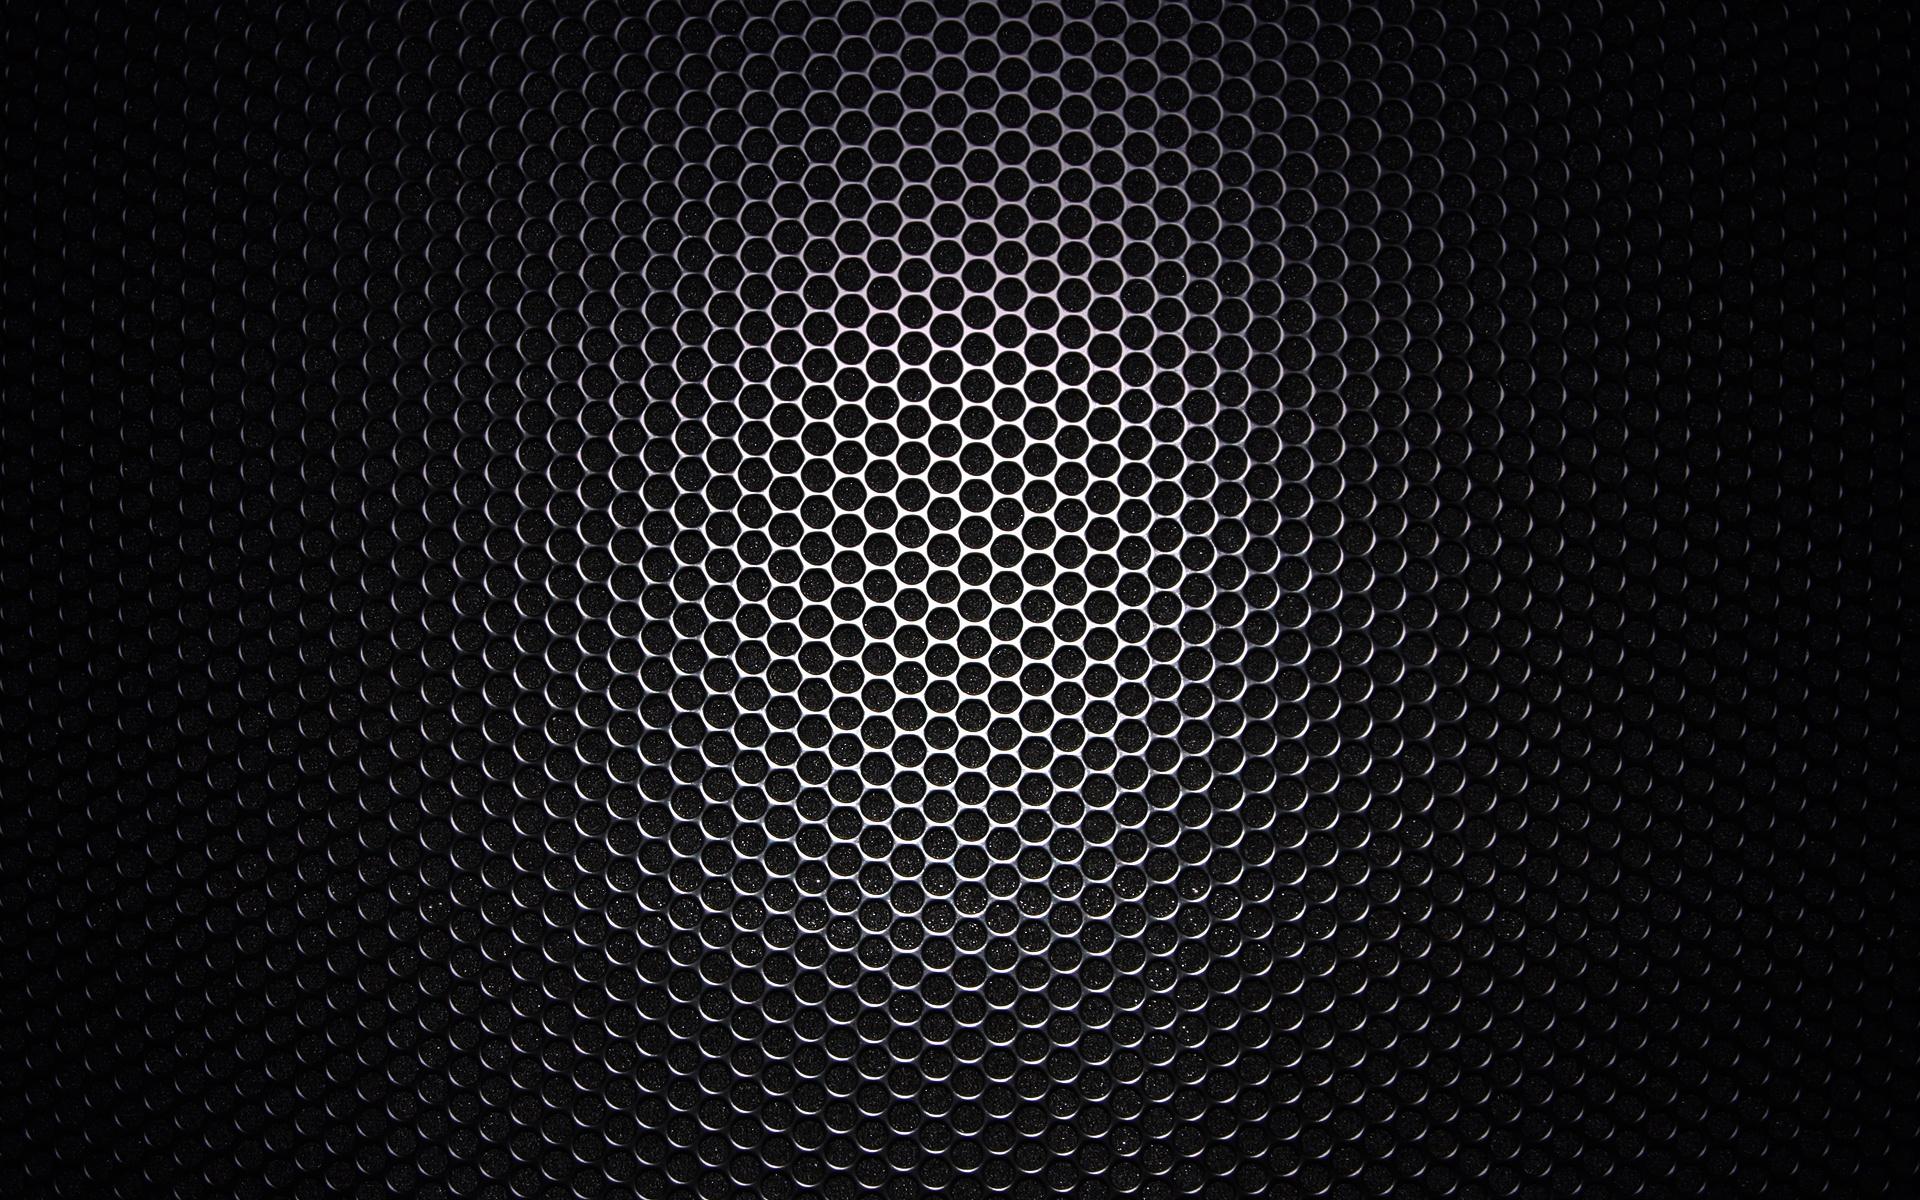 Black Honeycomb Pattern